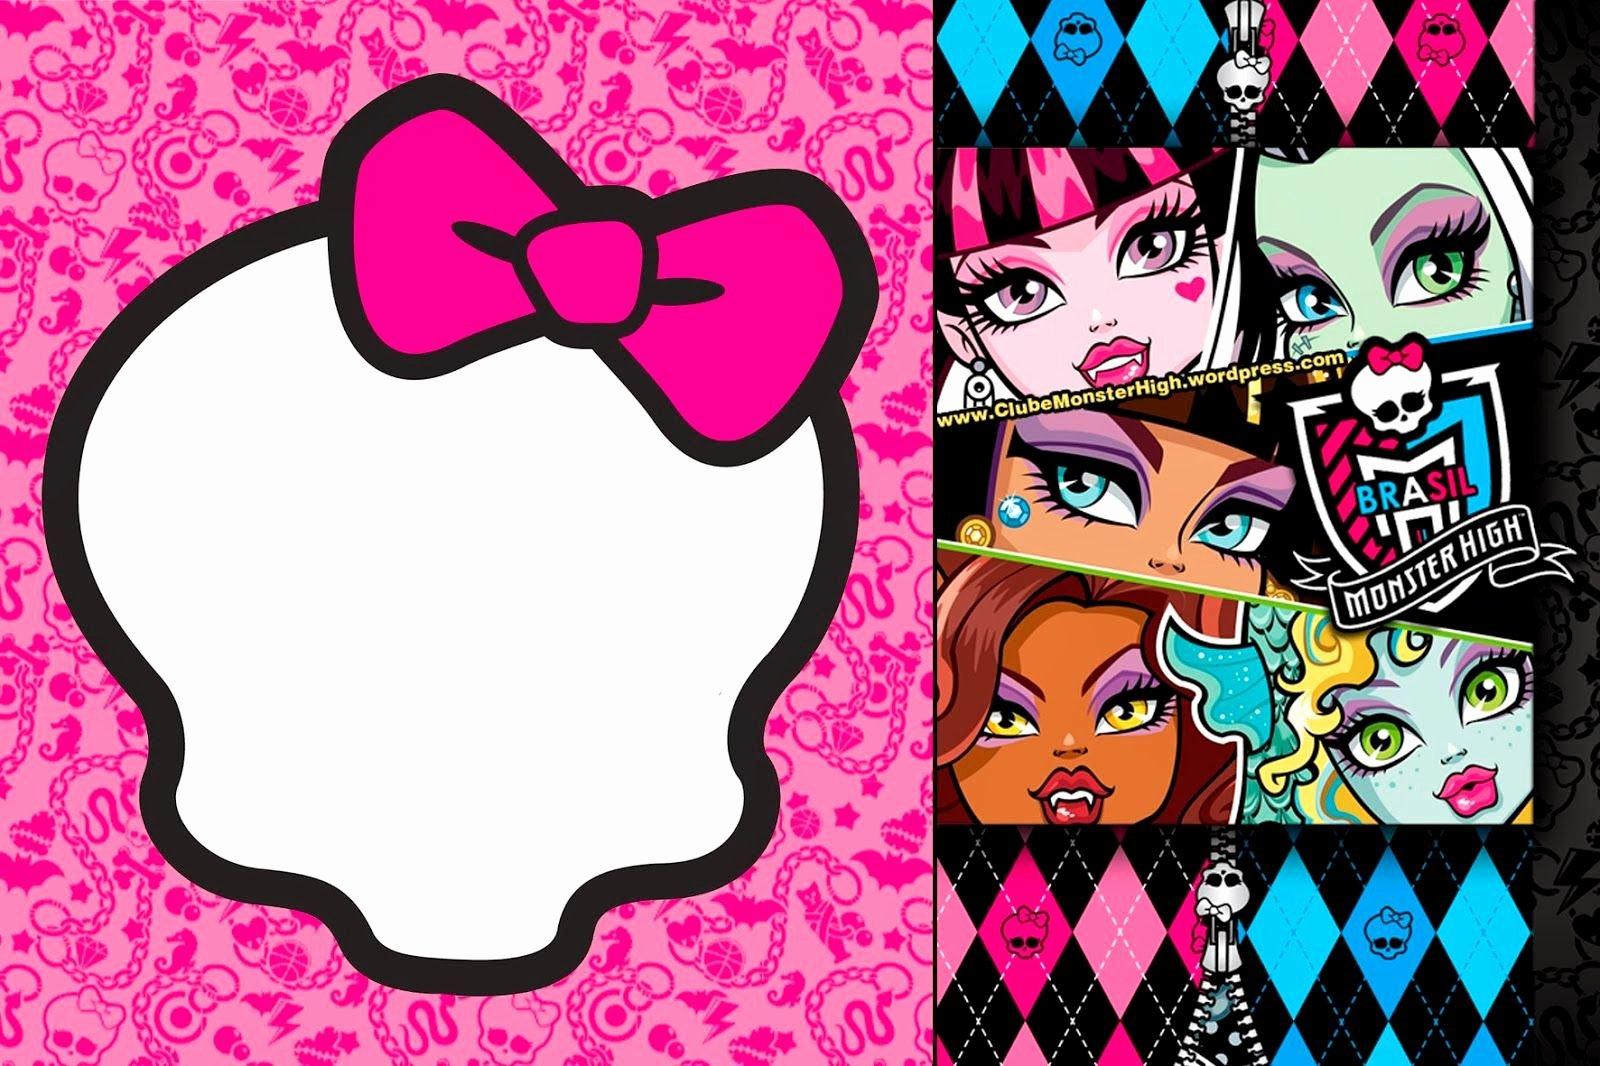 Monster High Invitations Templates Luxury Monster High Invitations On Pinterest